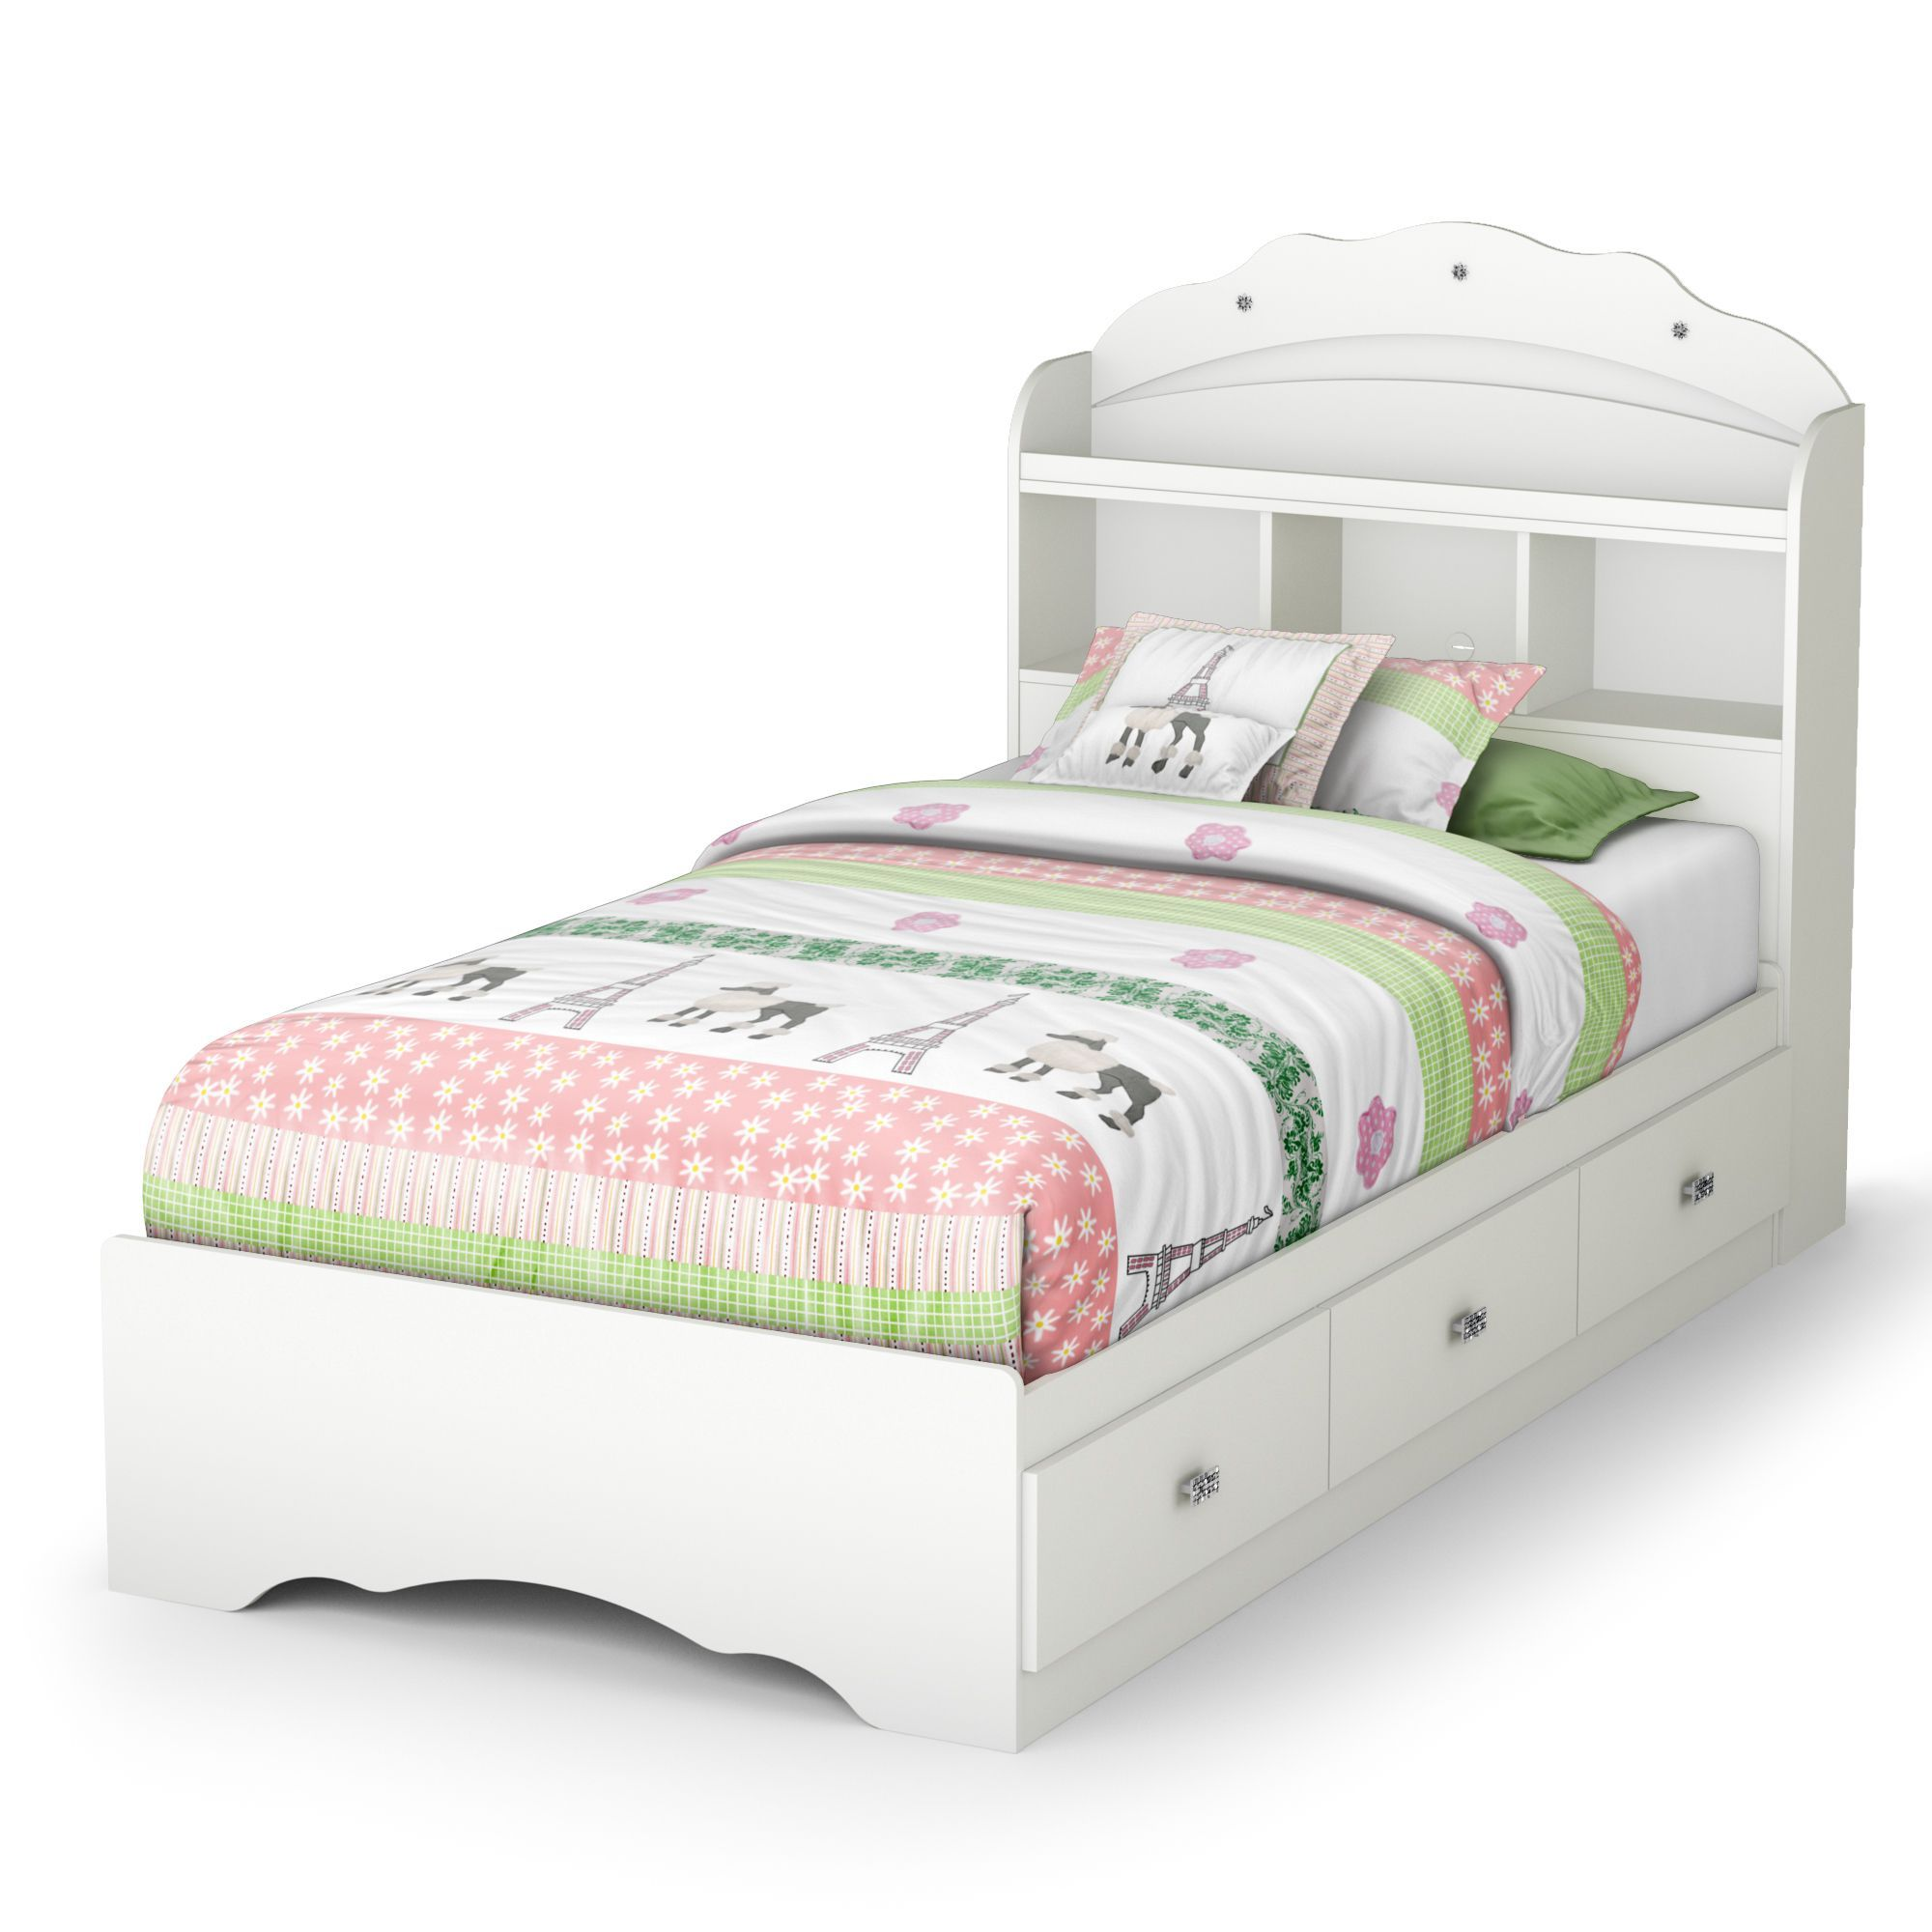 Fullsize Of Twin Bed Headboards